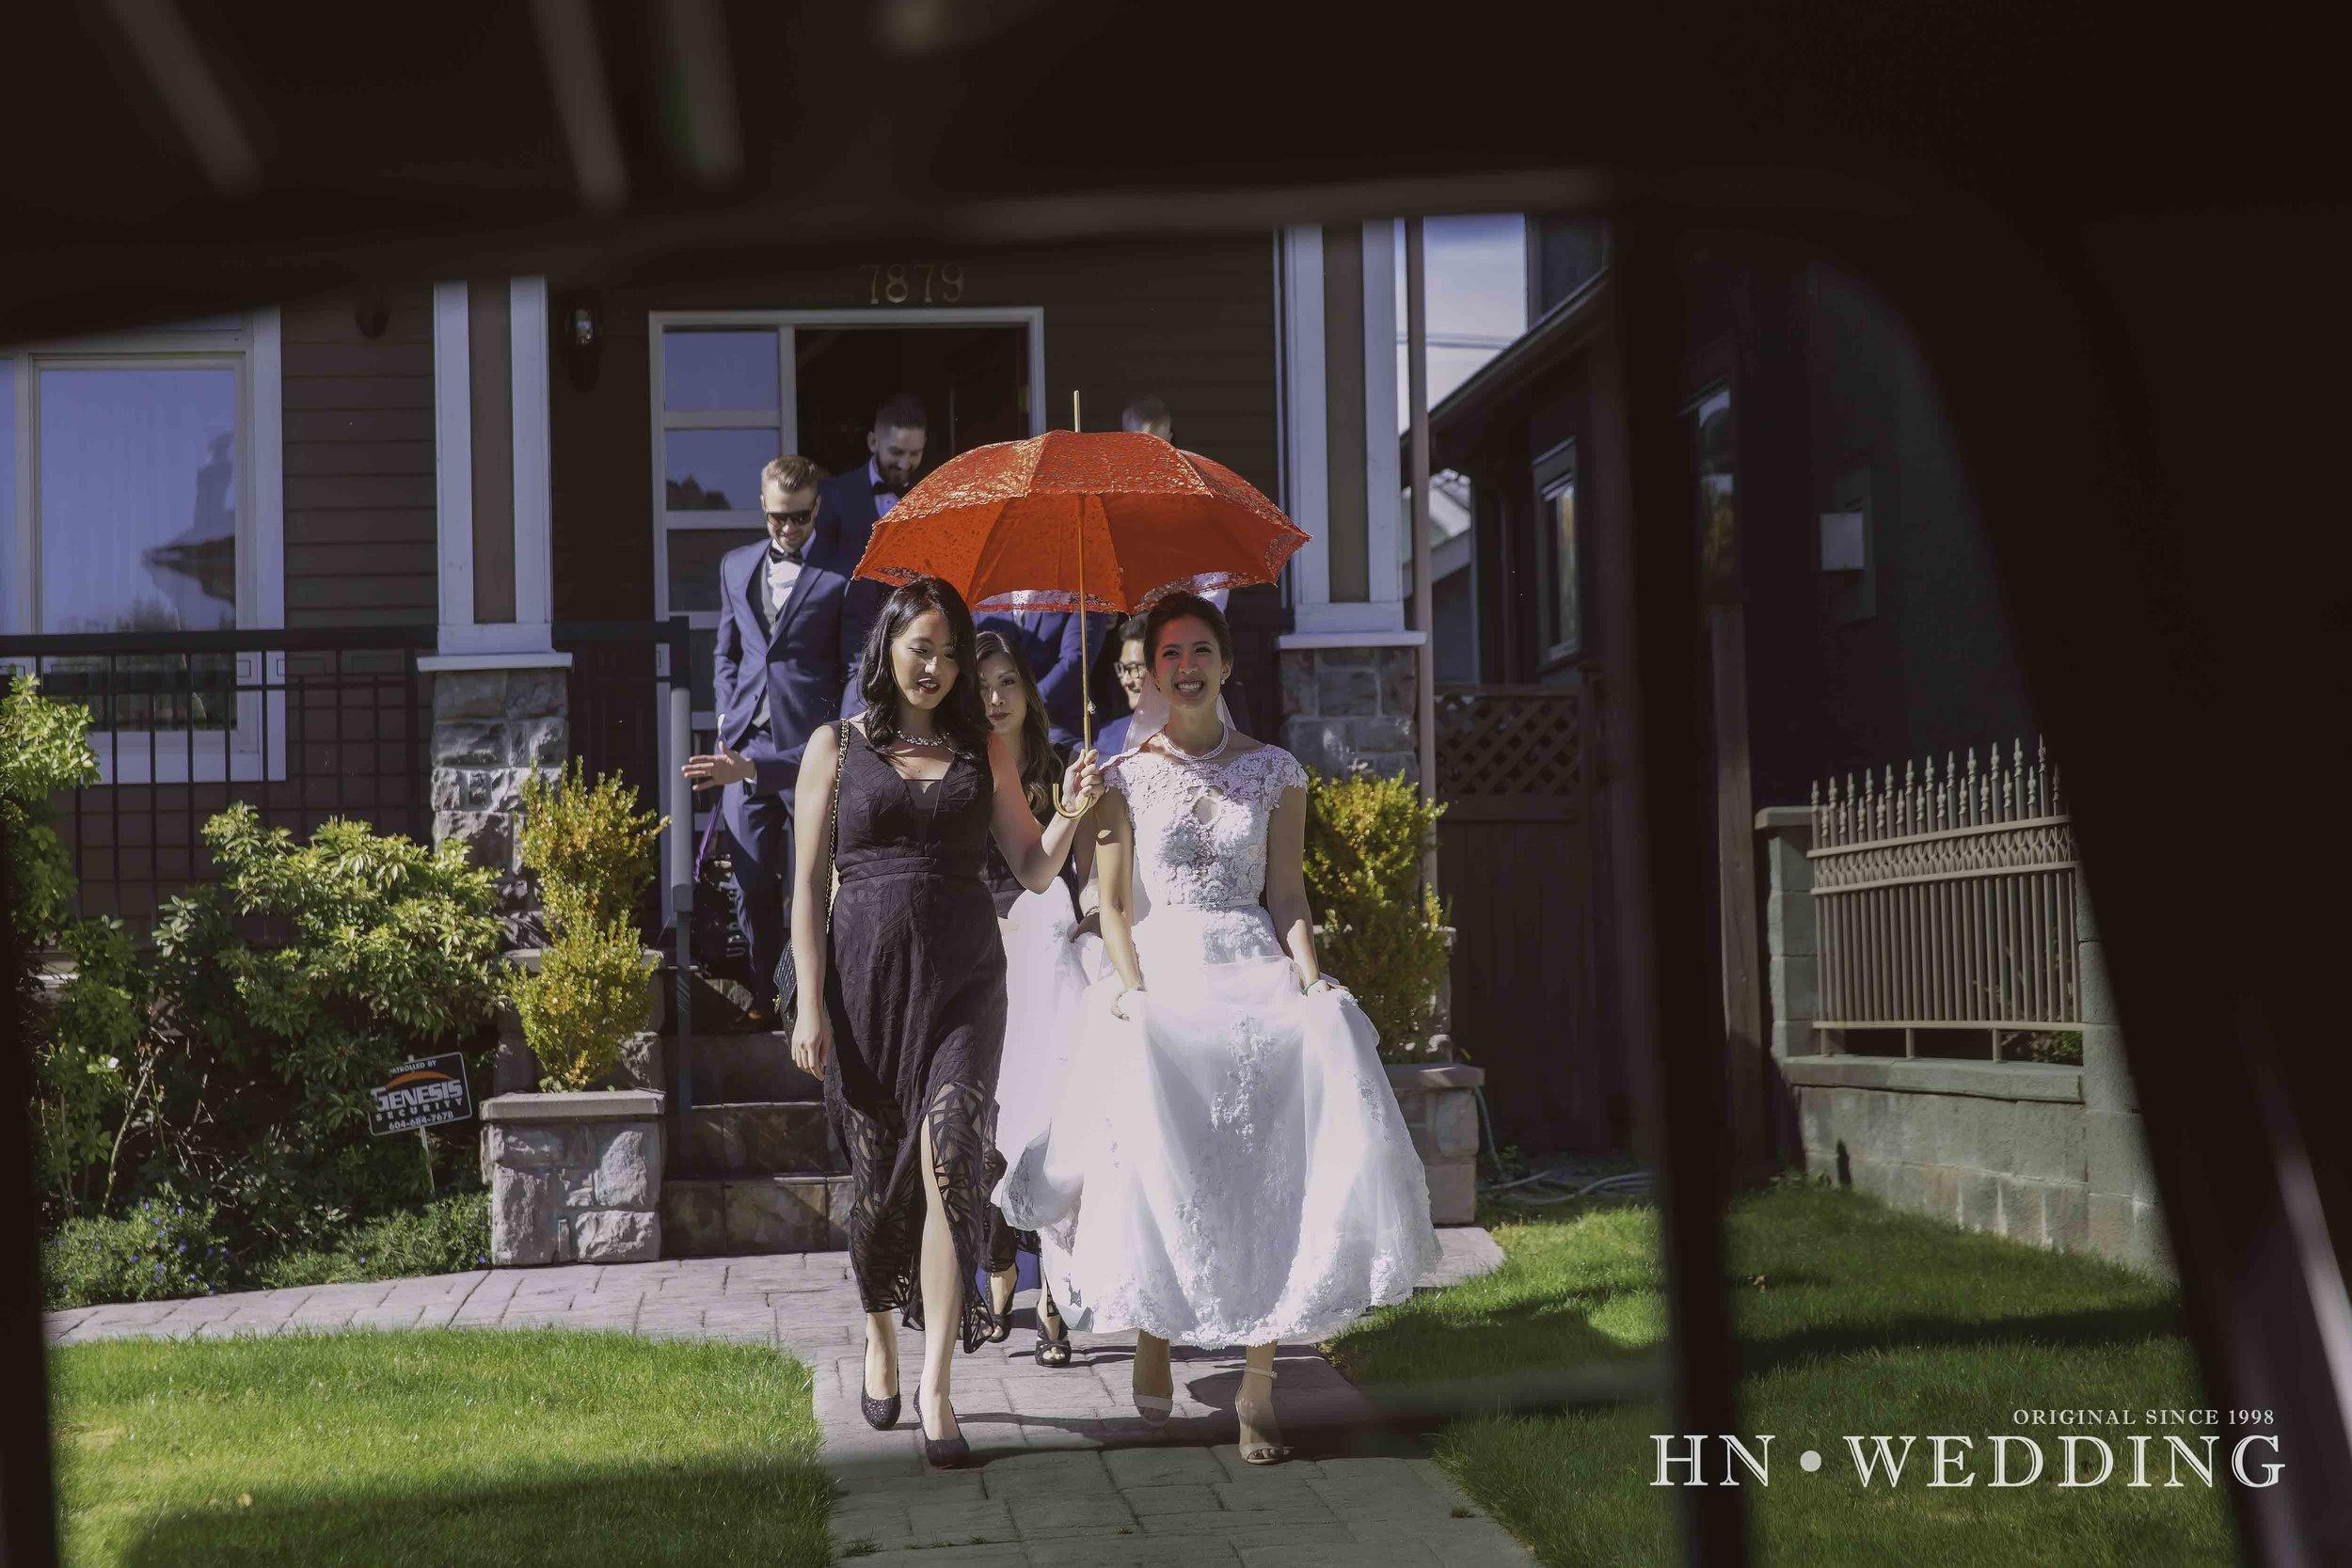 HNwedding-20160815-wedding-013.jpg